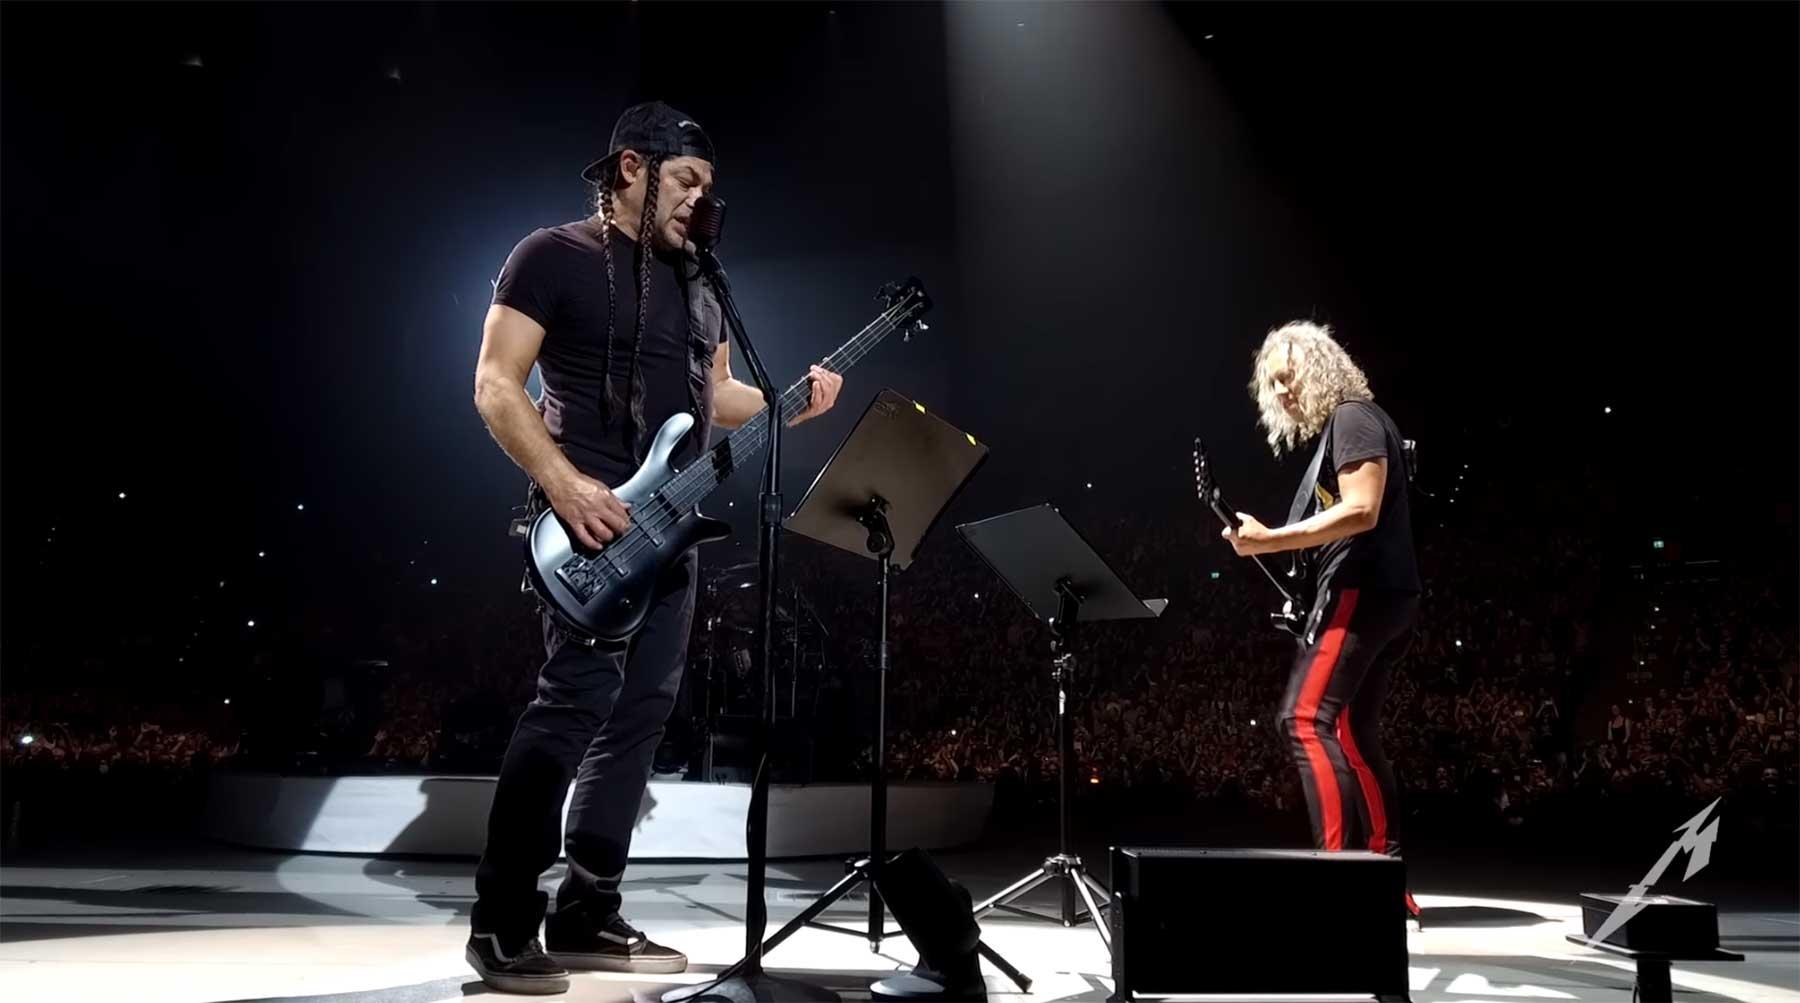 Metallica - Skandal im Sperrbezirk metallica-skandal-im-sperrbezirk